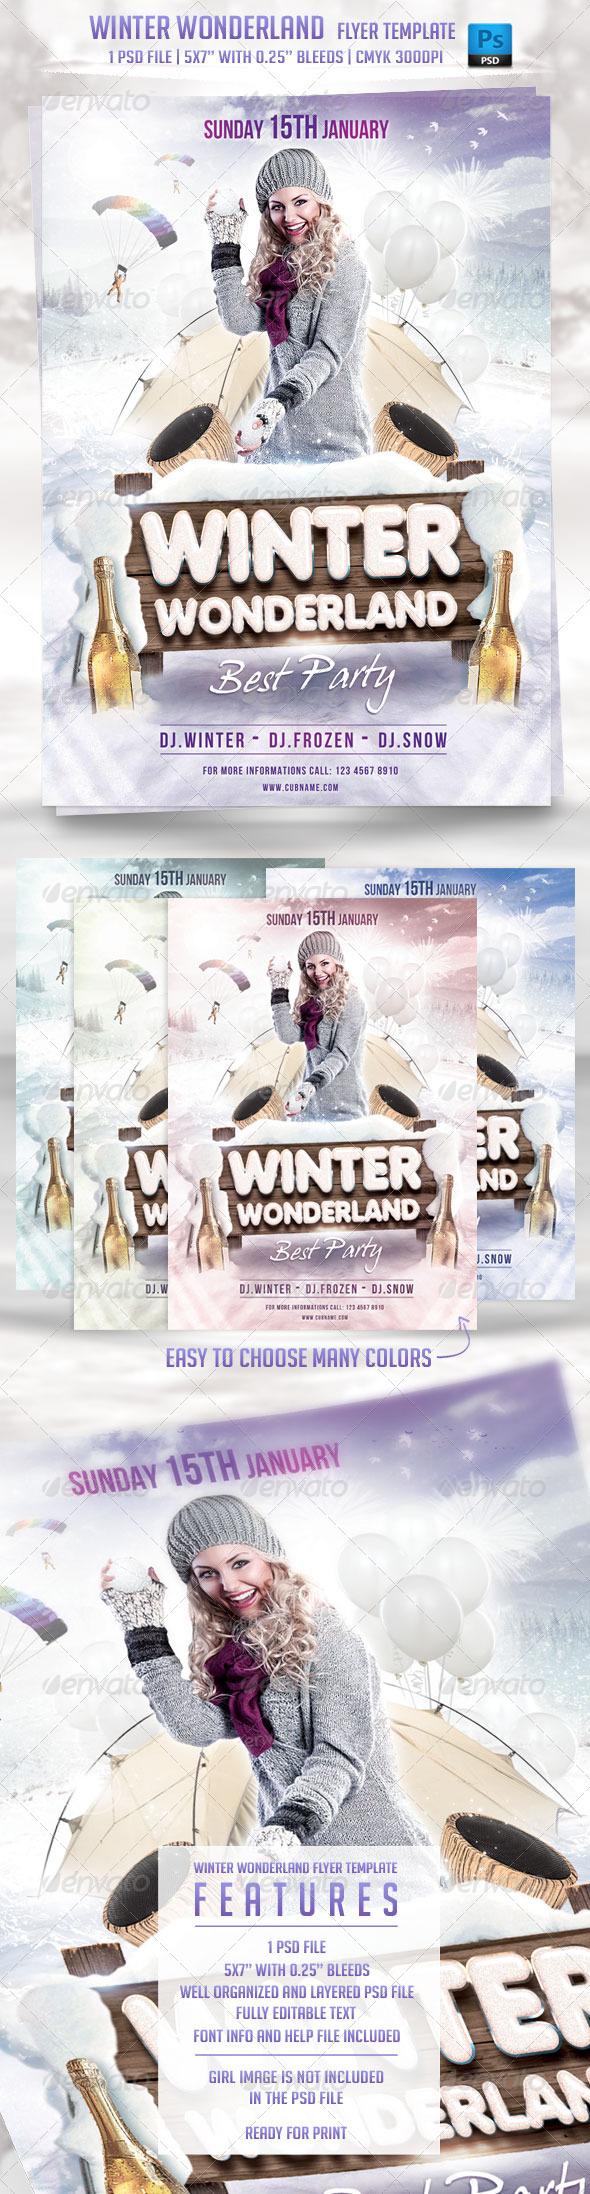 Winter Wonderland Flyer Template - Flyers Print Templates